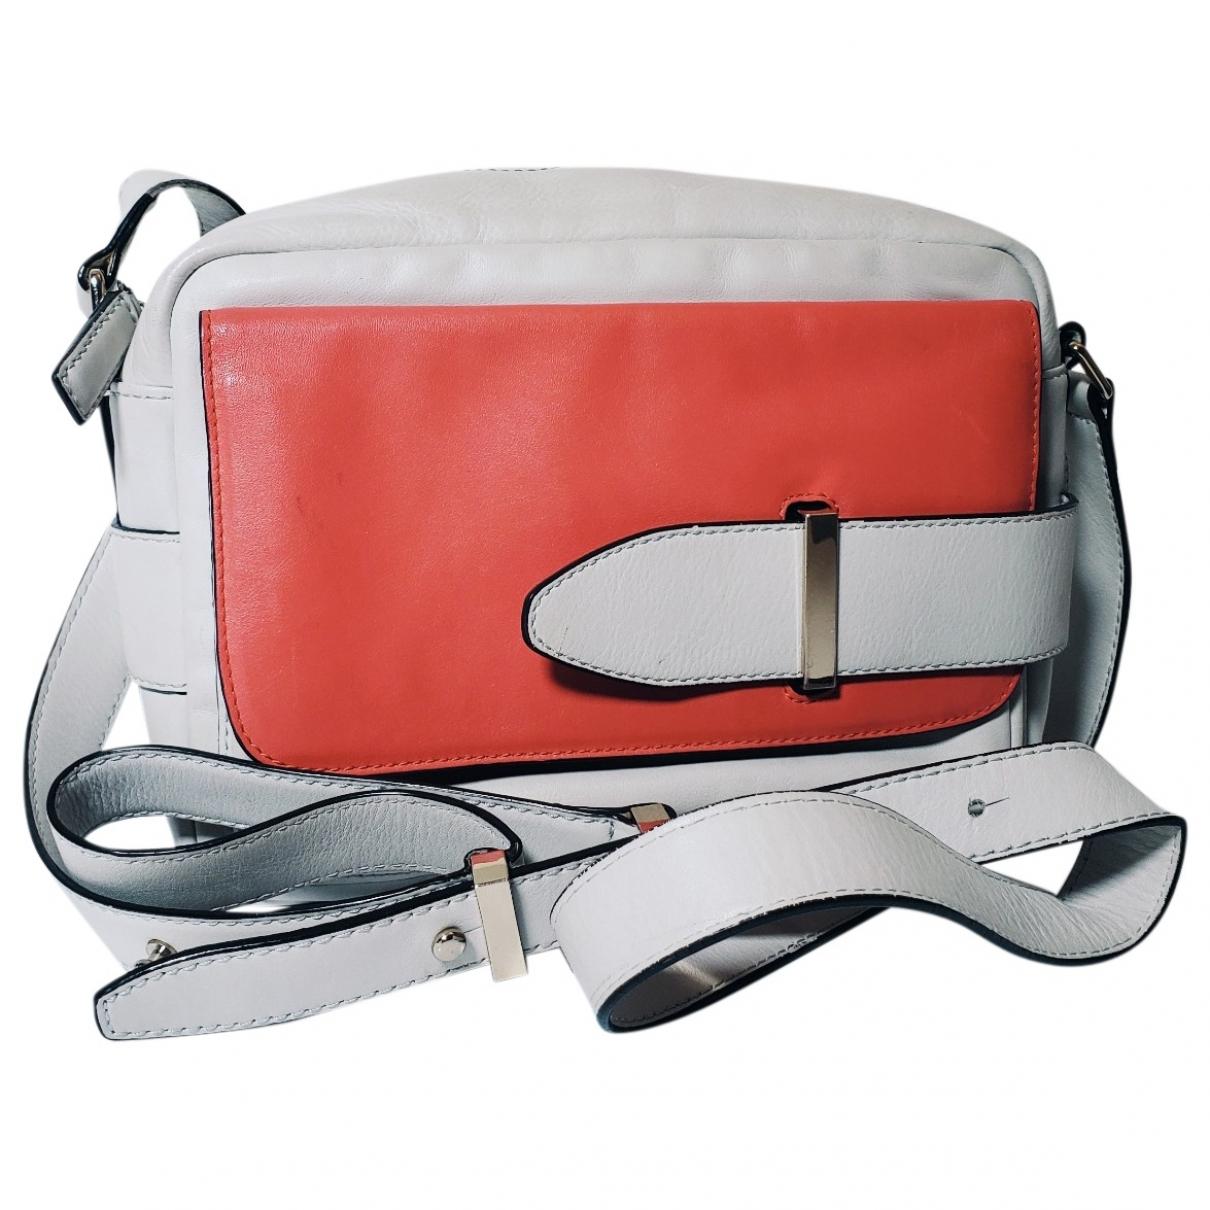 Tila March \N Handtasche in  Ecru Leder